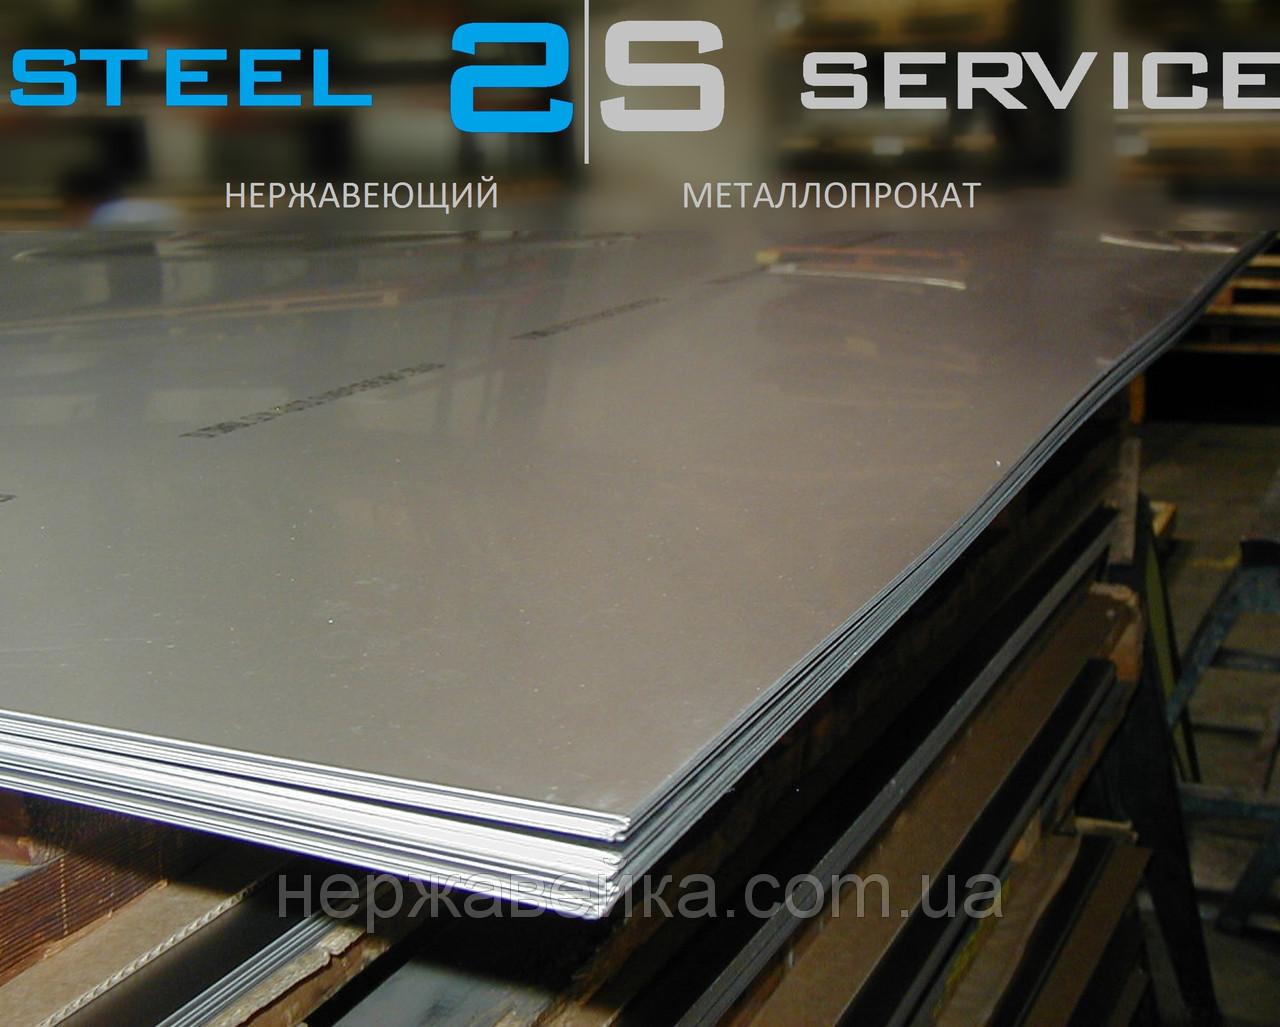 Нержавейка лист 1х1250х2500мм  AISI 316Ti(10Х17Н13М2Т) 2B - матовый,  кислотостойкий